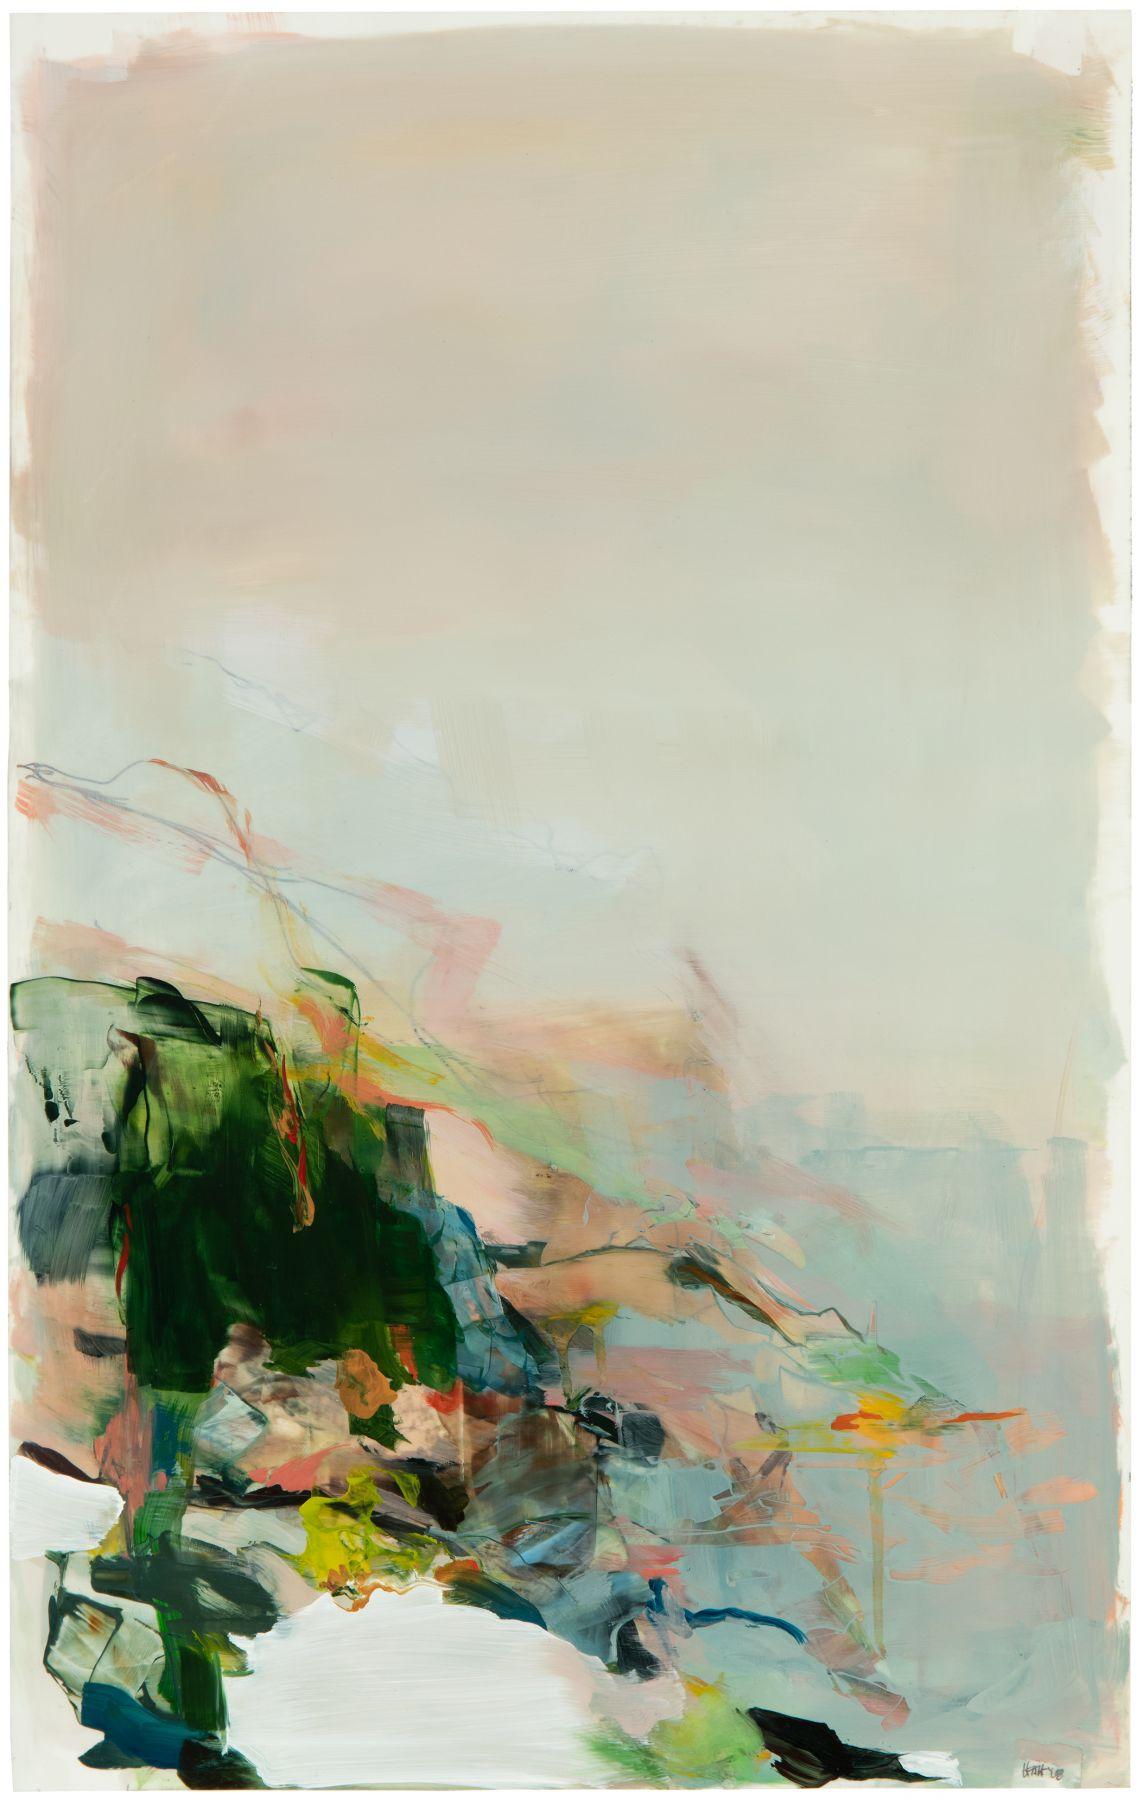 Hollis Heichemer (b. 1963) #14, 2018